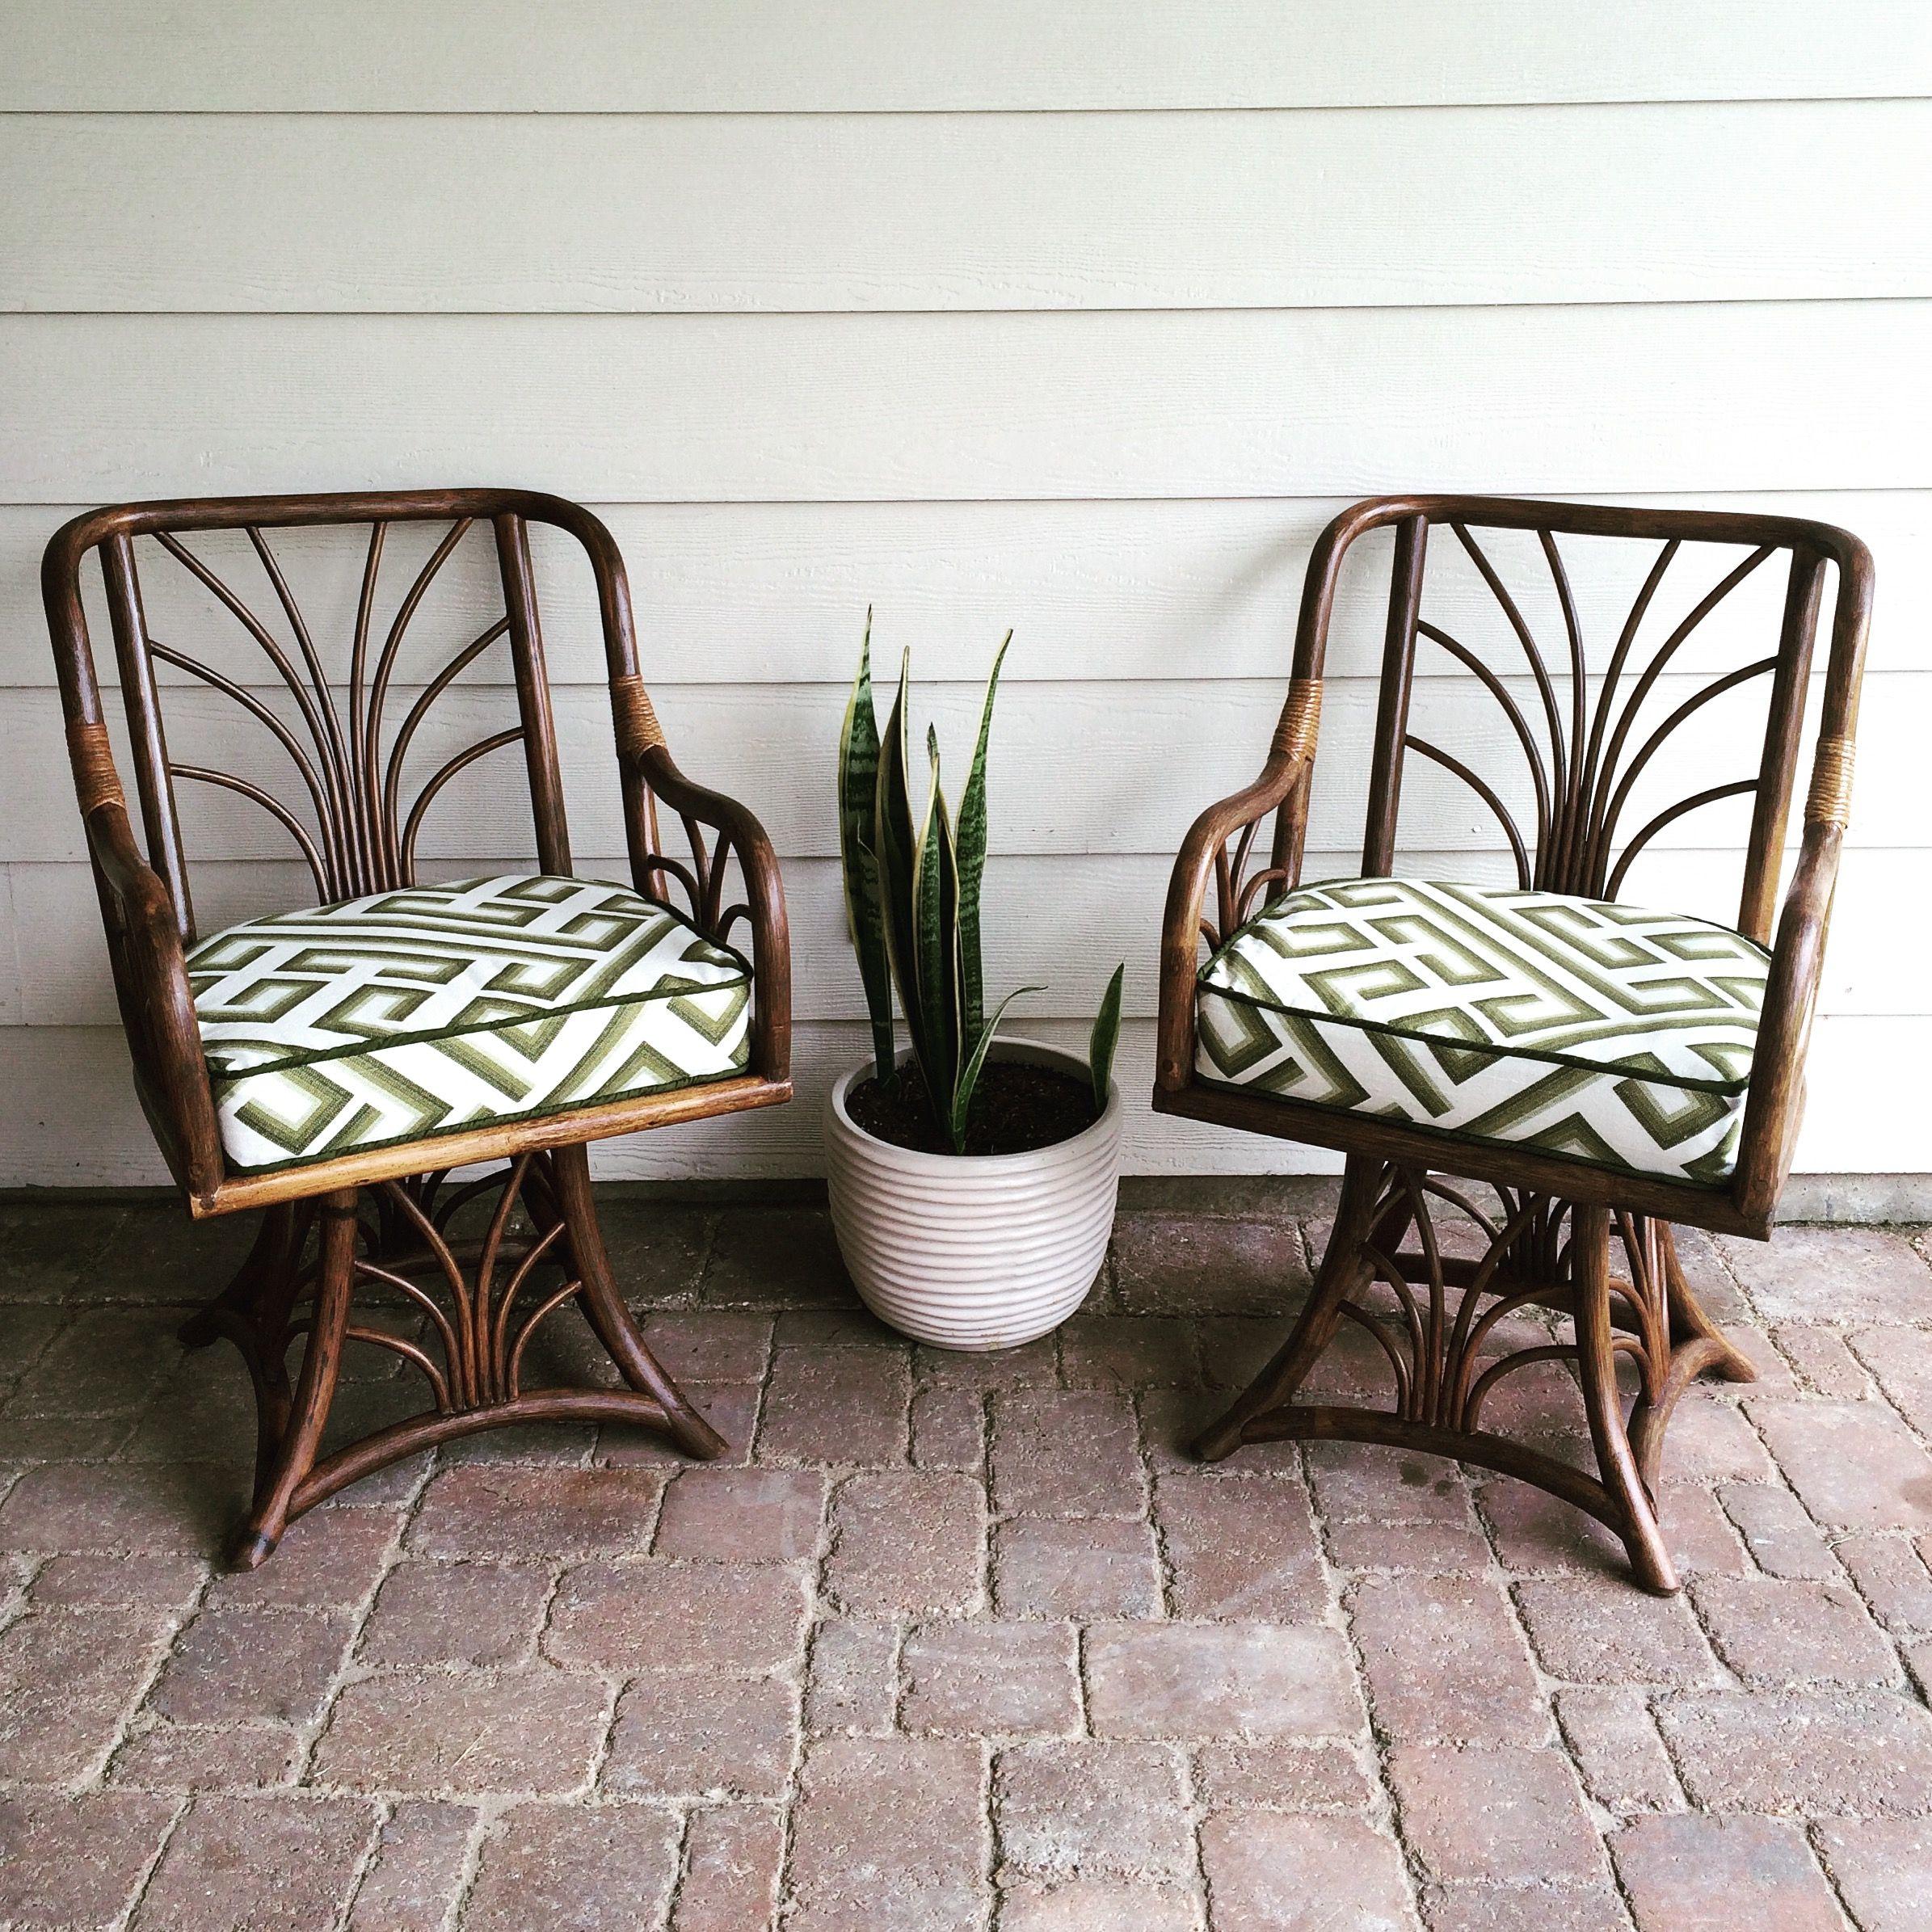 Gorgeous Bamboo Rattan Swivel Chairs Custom made cushions using